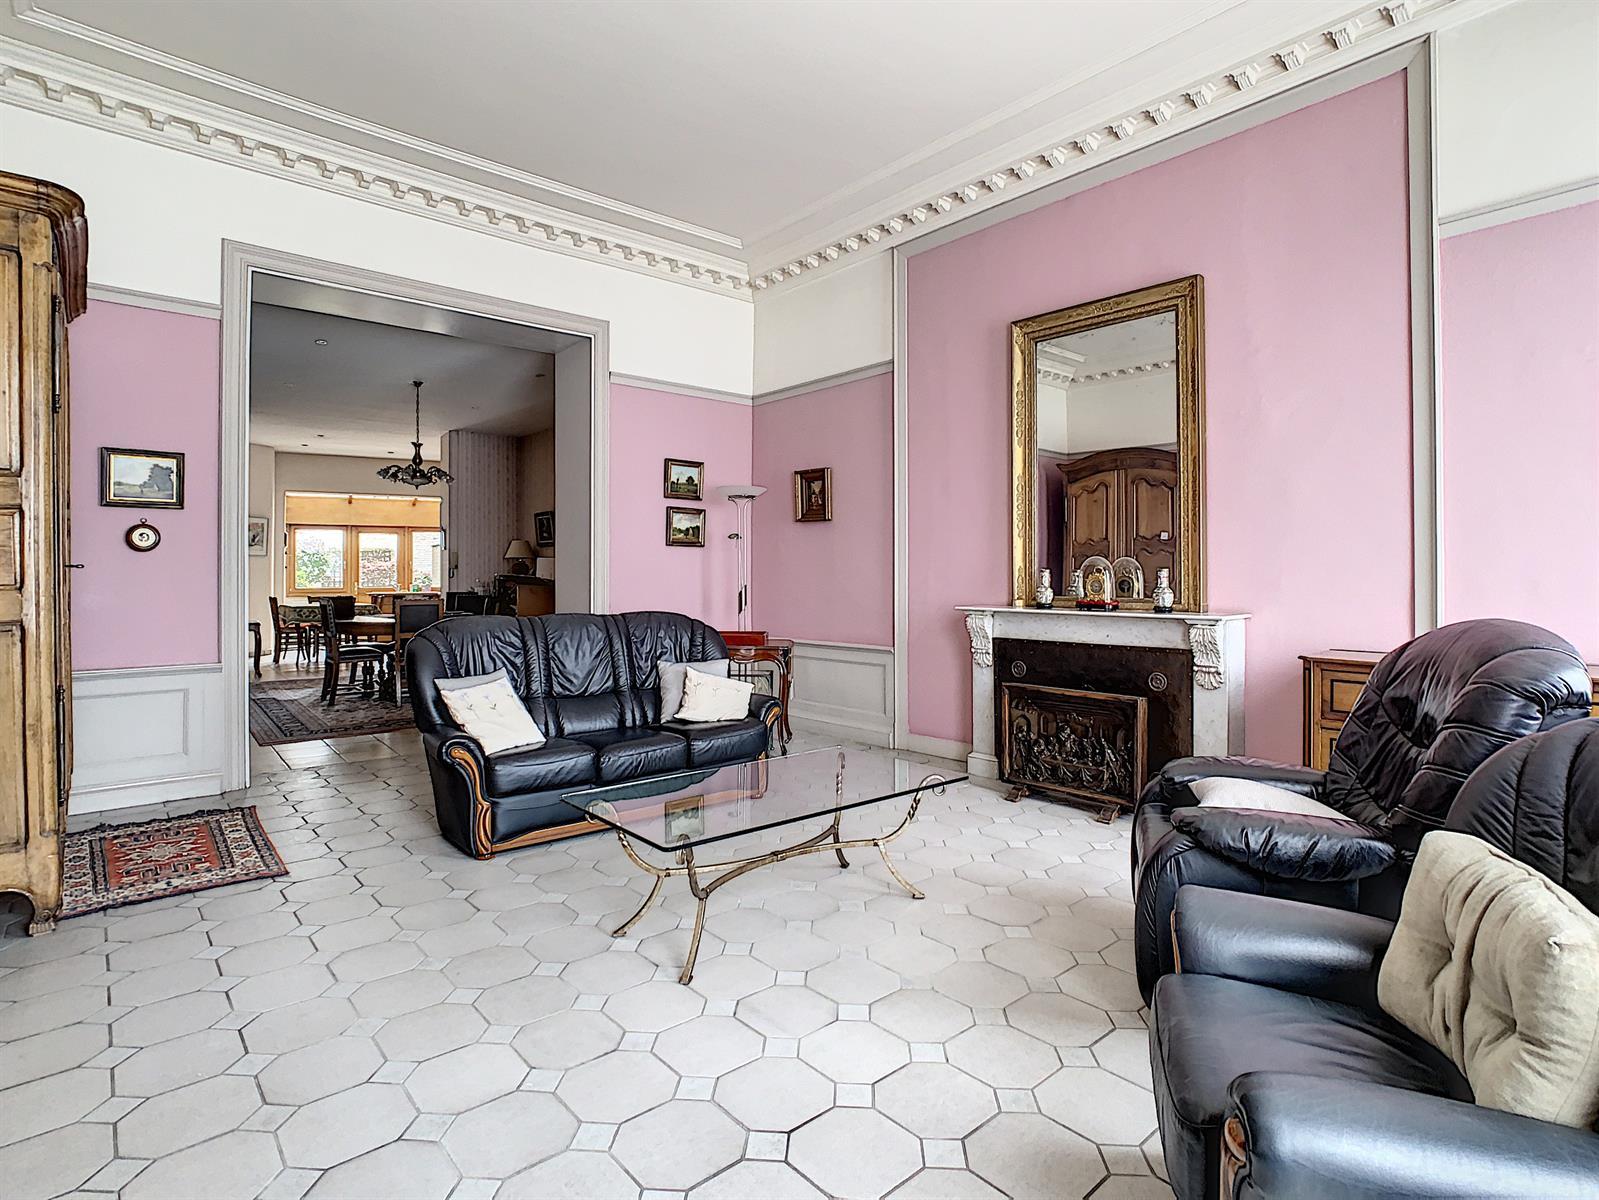 Spacieuse maison bourgeoise